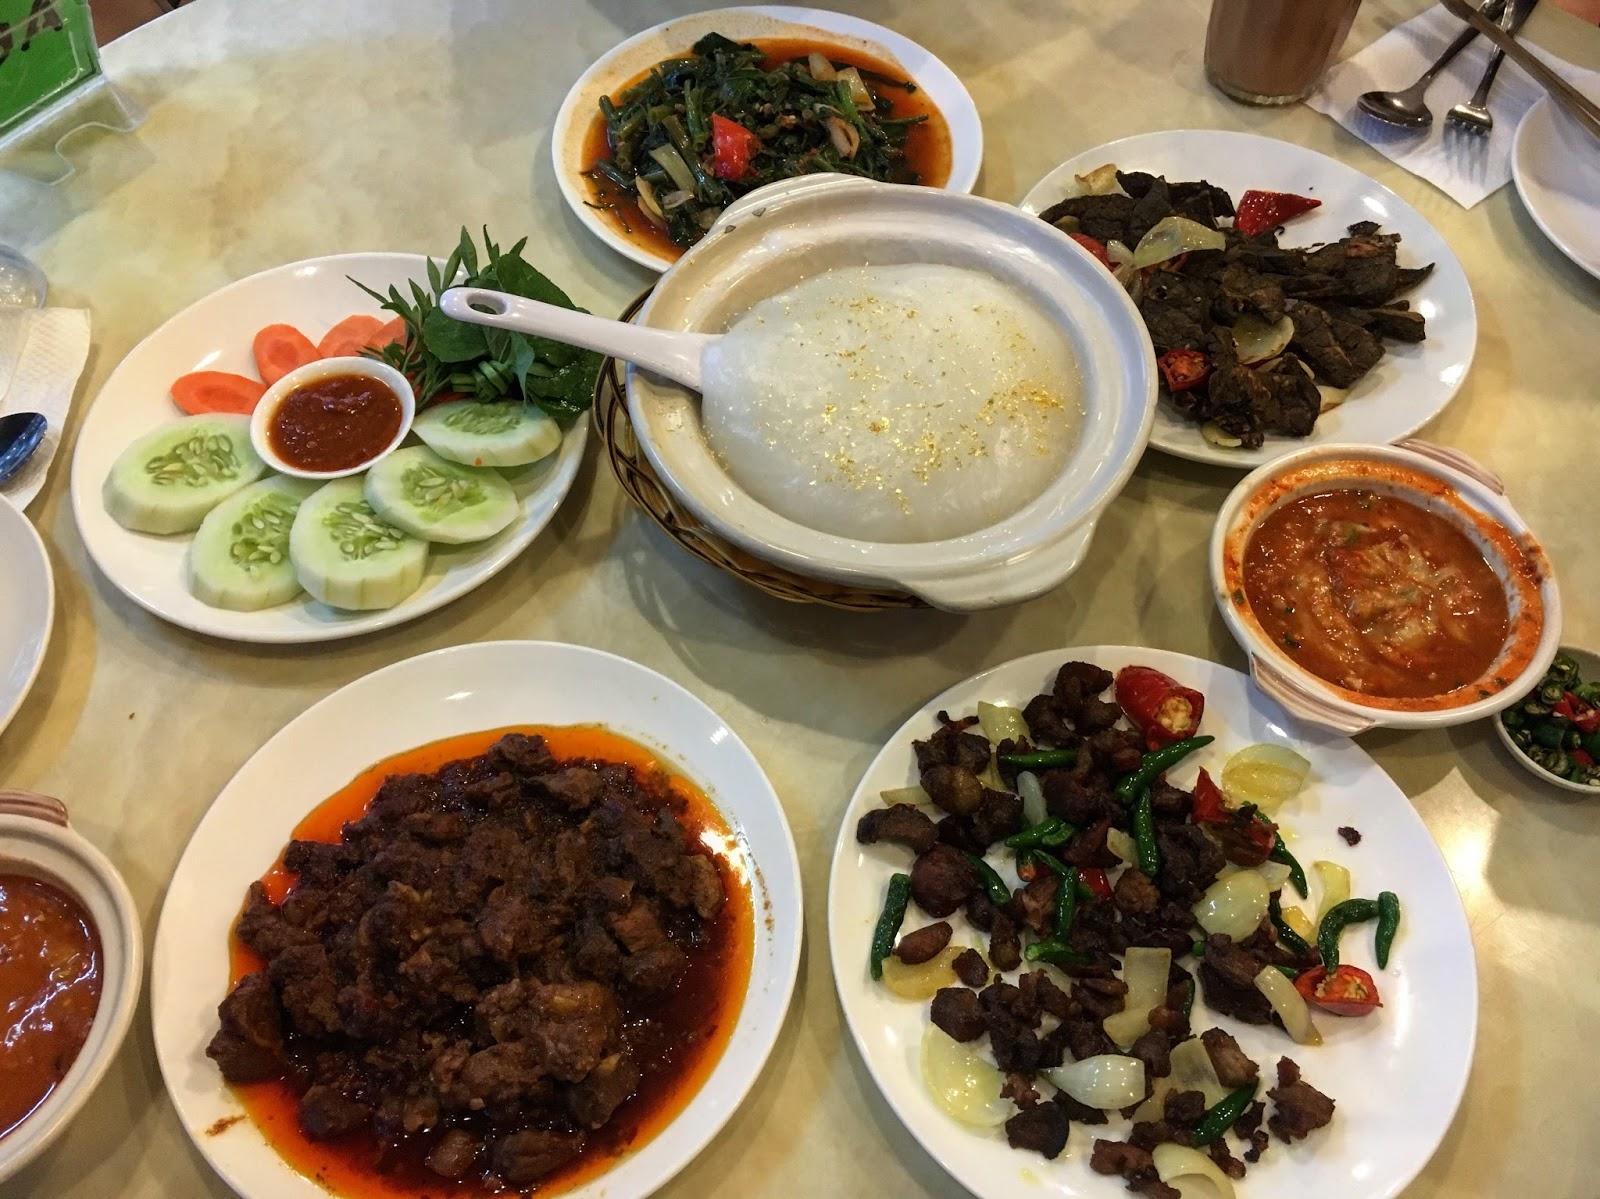 Makanan Tradisonal Khas Halal Brunei Darussalam Kesukaaan Traveler Indonesia